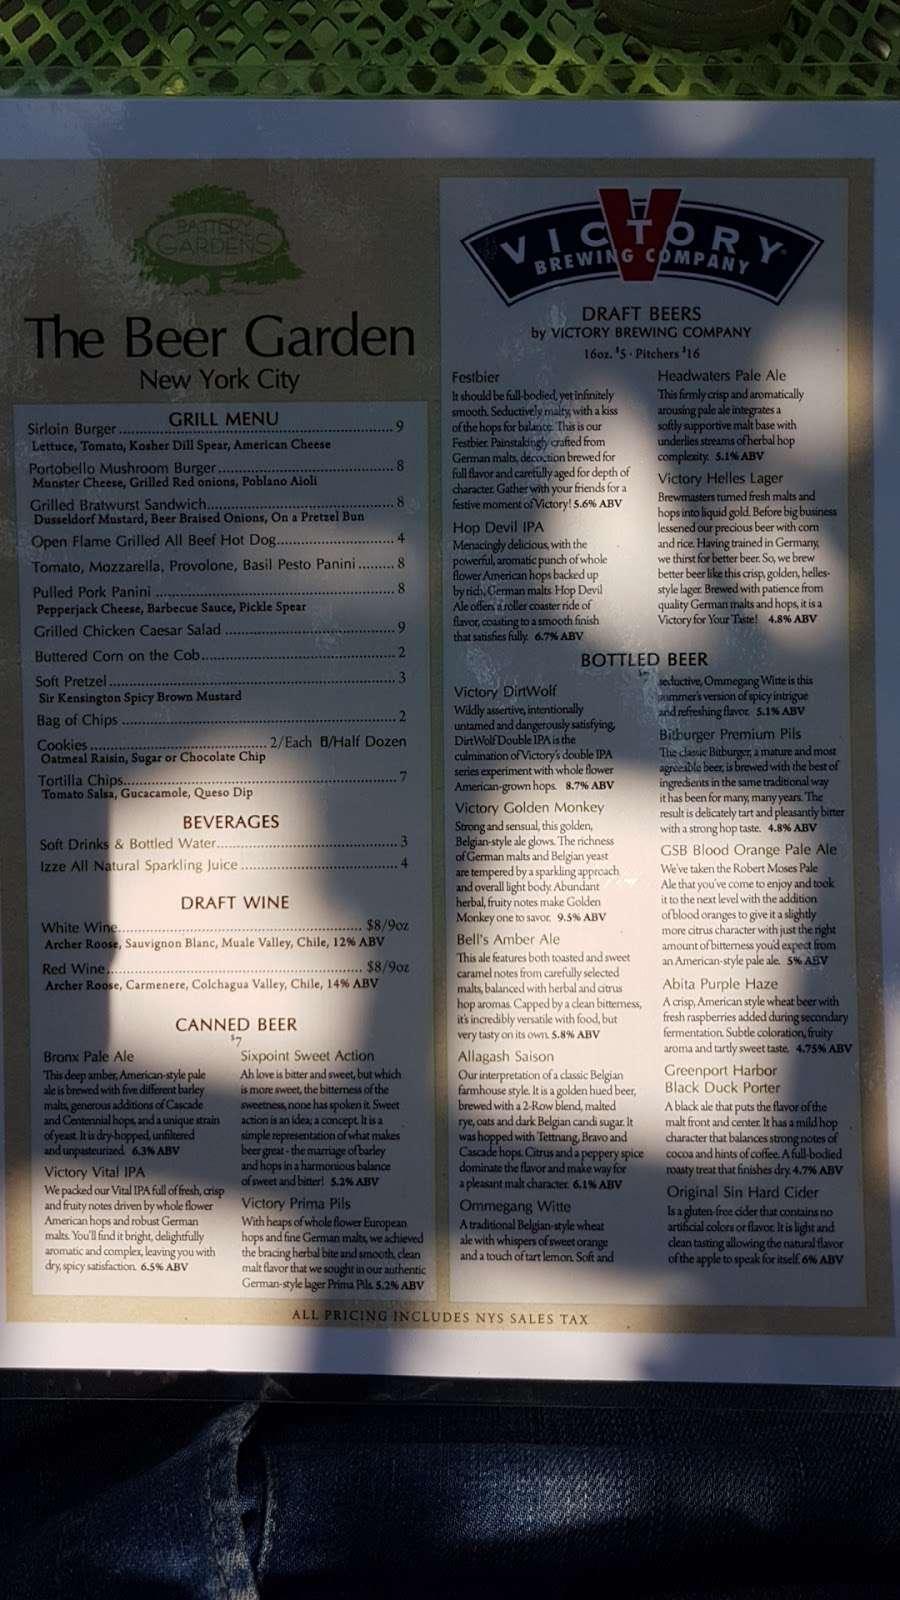 The Beer Garden - restaurant  | Photo 2 of 4 | Address: New York, NY 10004, USA